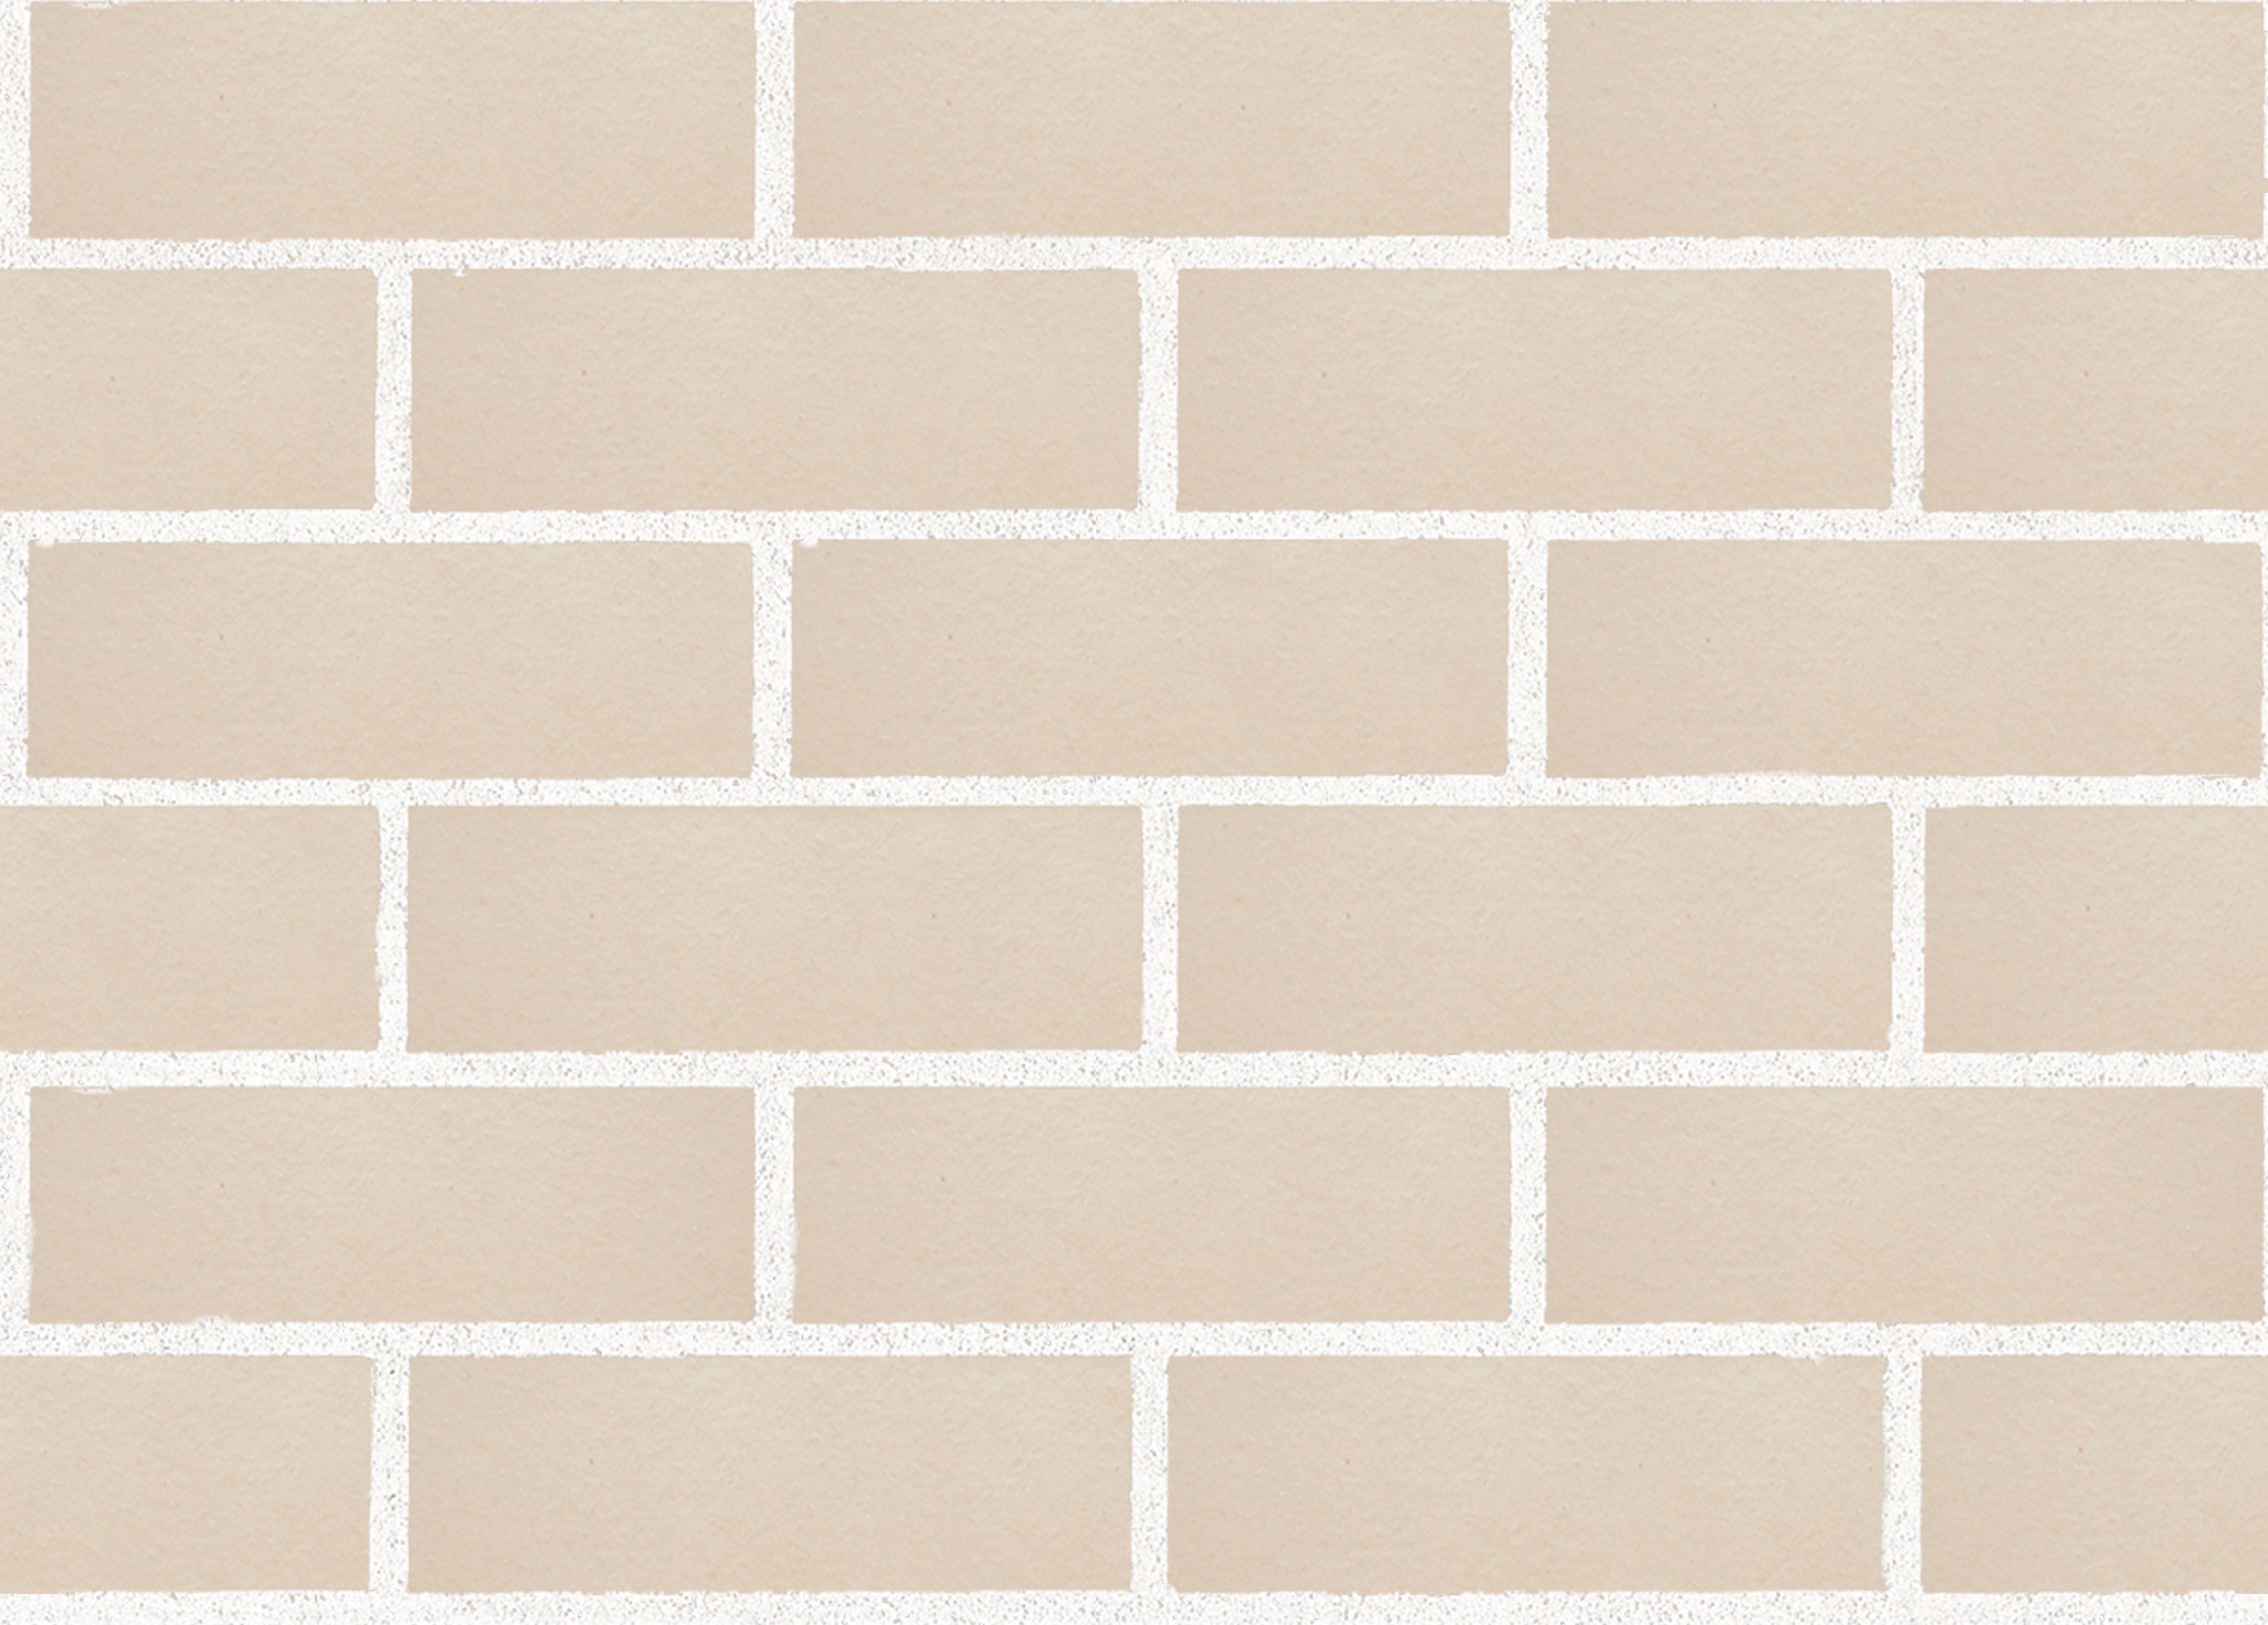 Bricks N More Bathurst Bathurst Nsw Bricks